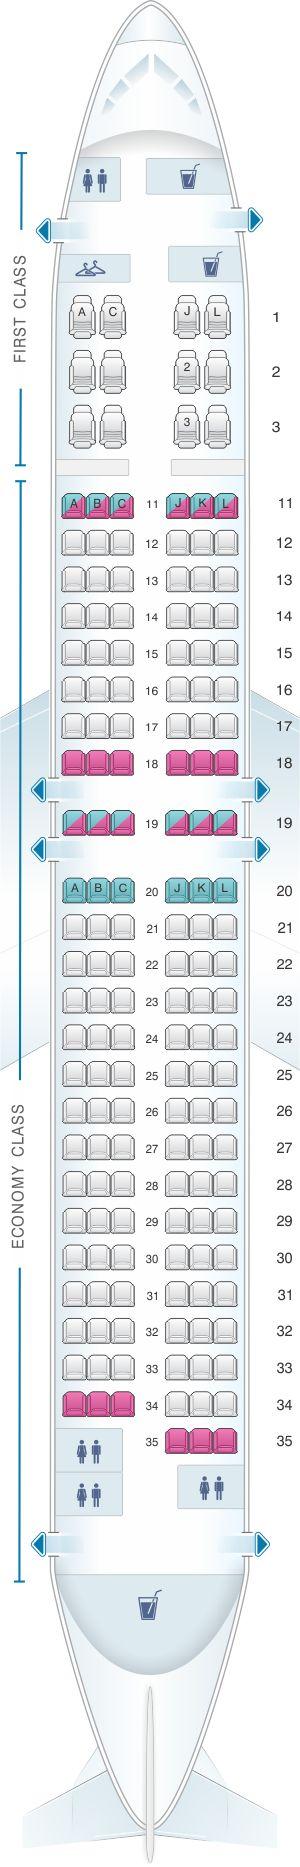 Seat Map Air China Boeing B737 800 (159PAX)